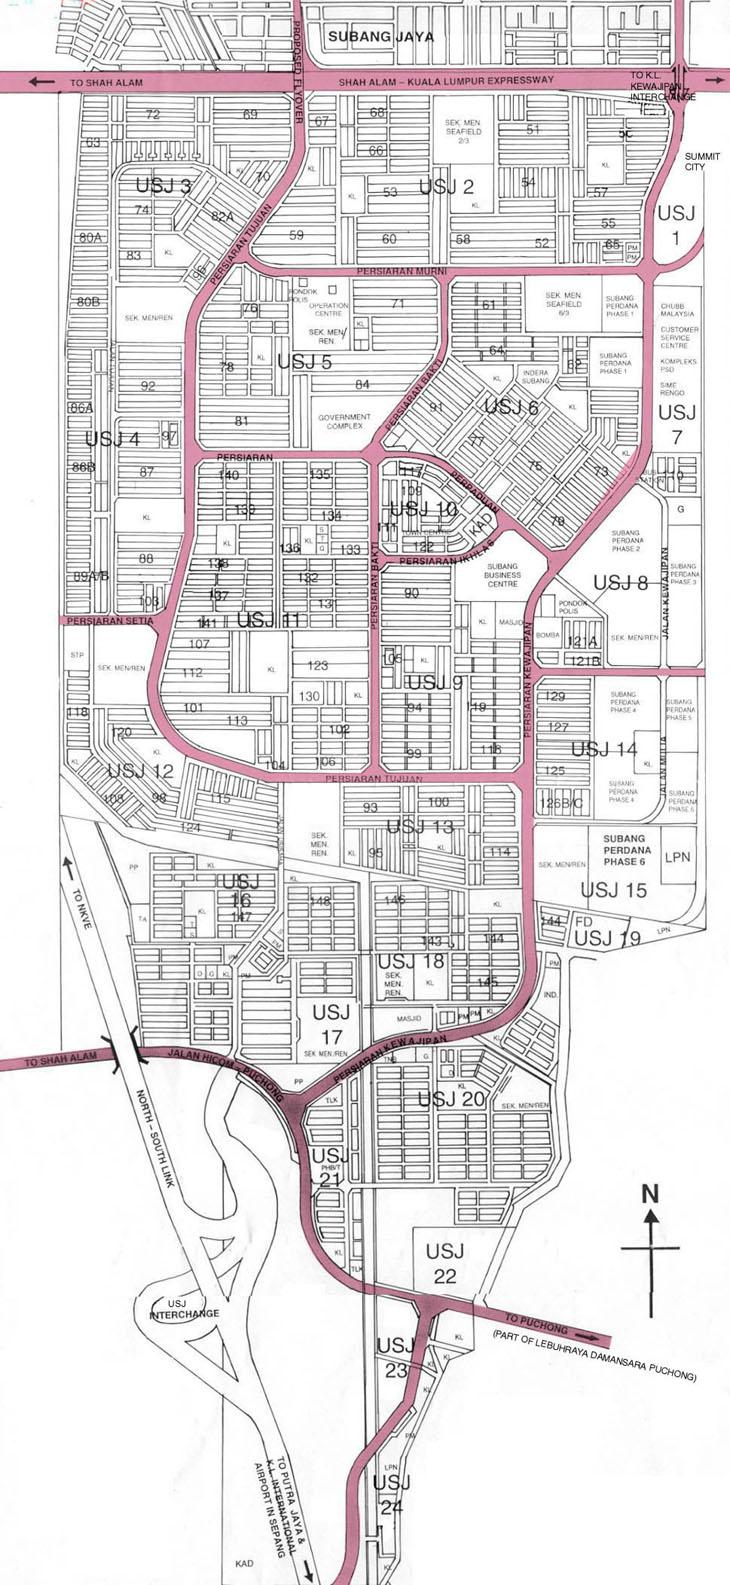 USJ Subang Jaya eCommunity Map of USJ